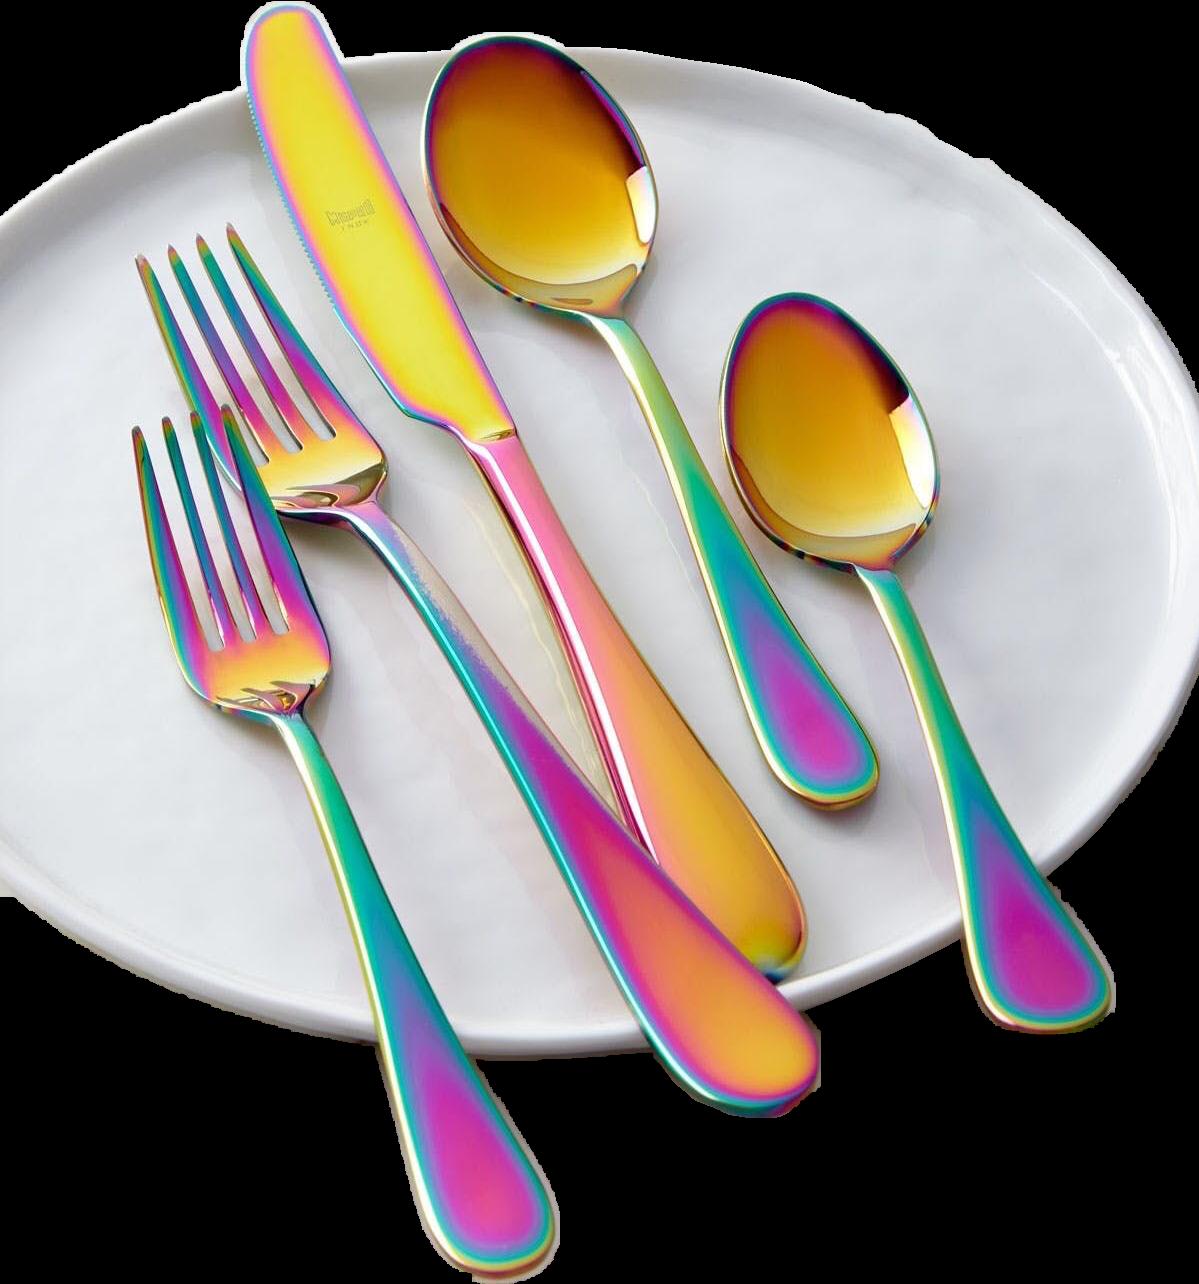 Spoon knife fork unicorn. Dinner clipart plate silverware